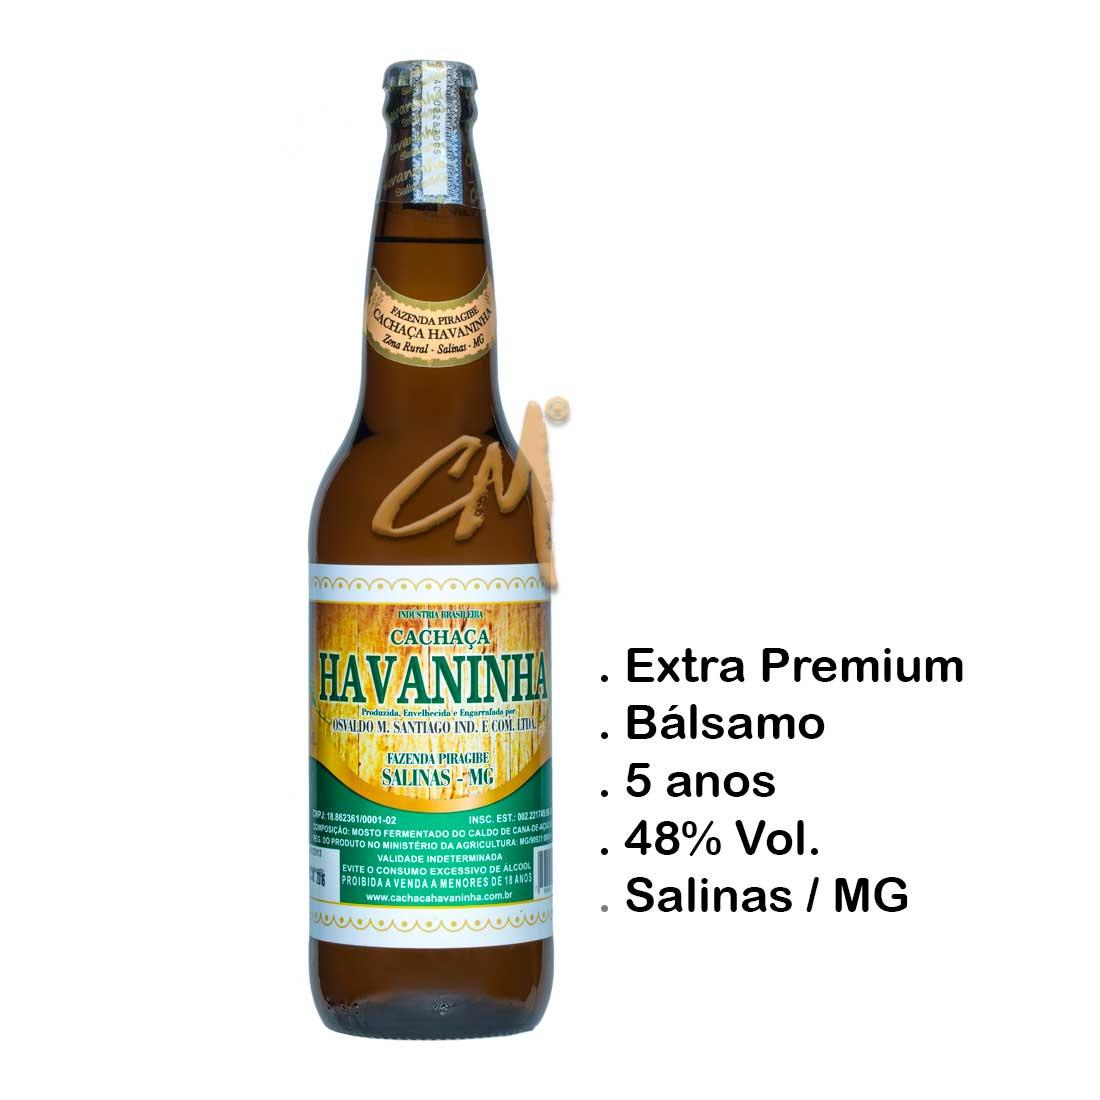 Cachaça Havaninha 600 ml   (Salinas - MG)